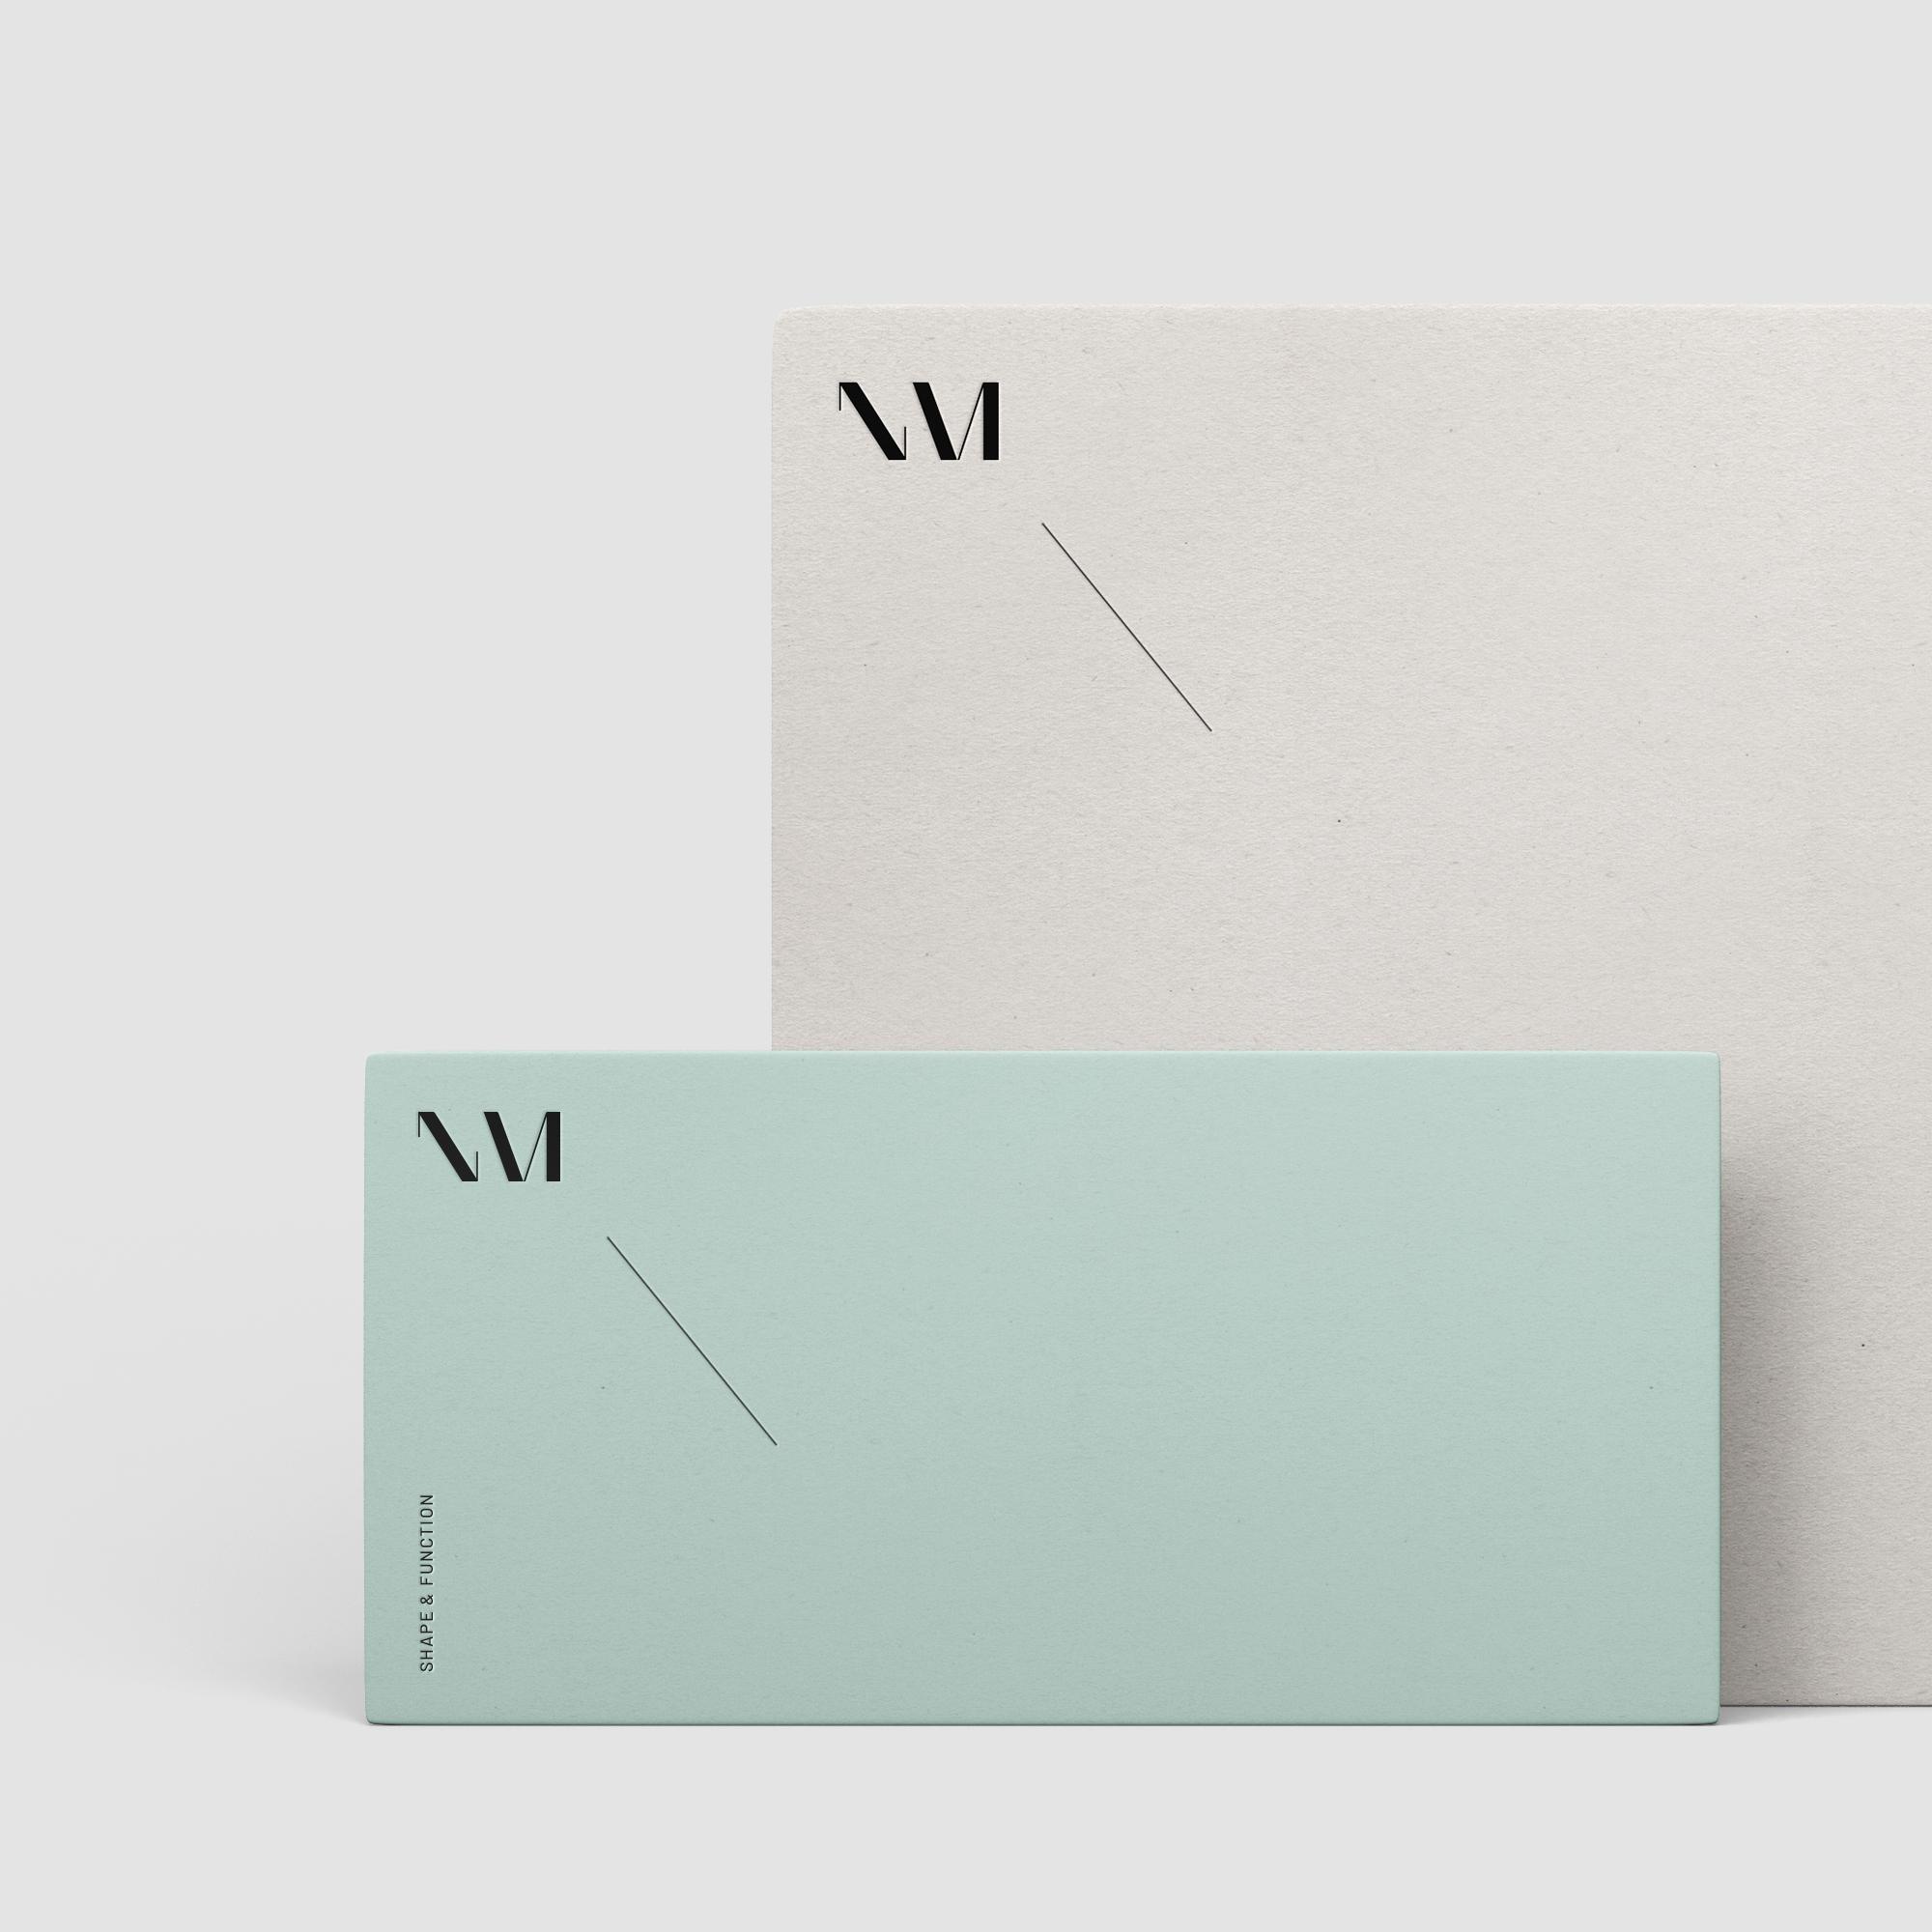 NM-Envelopes.jpg